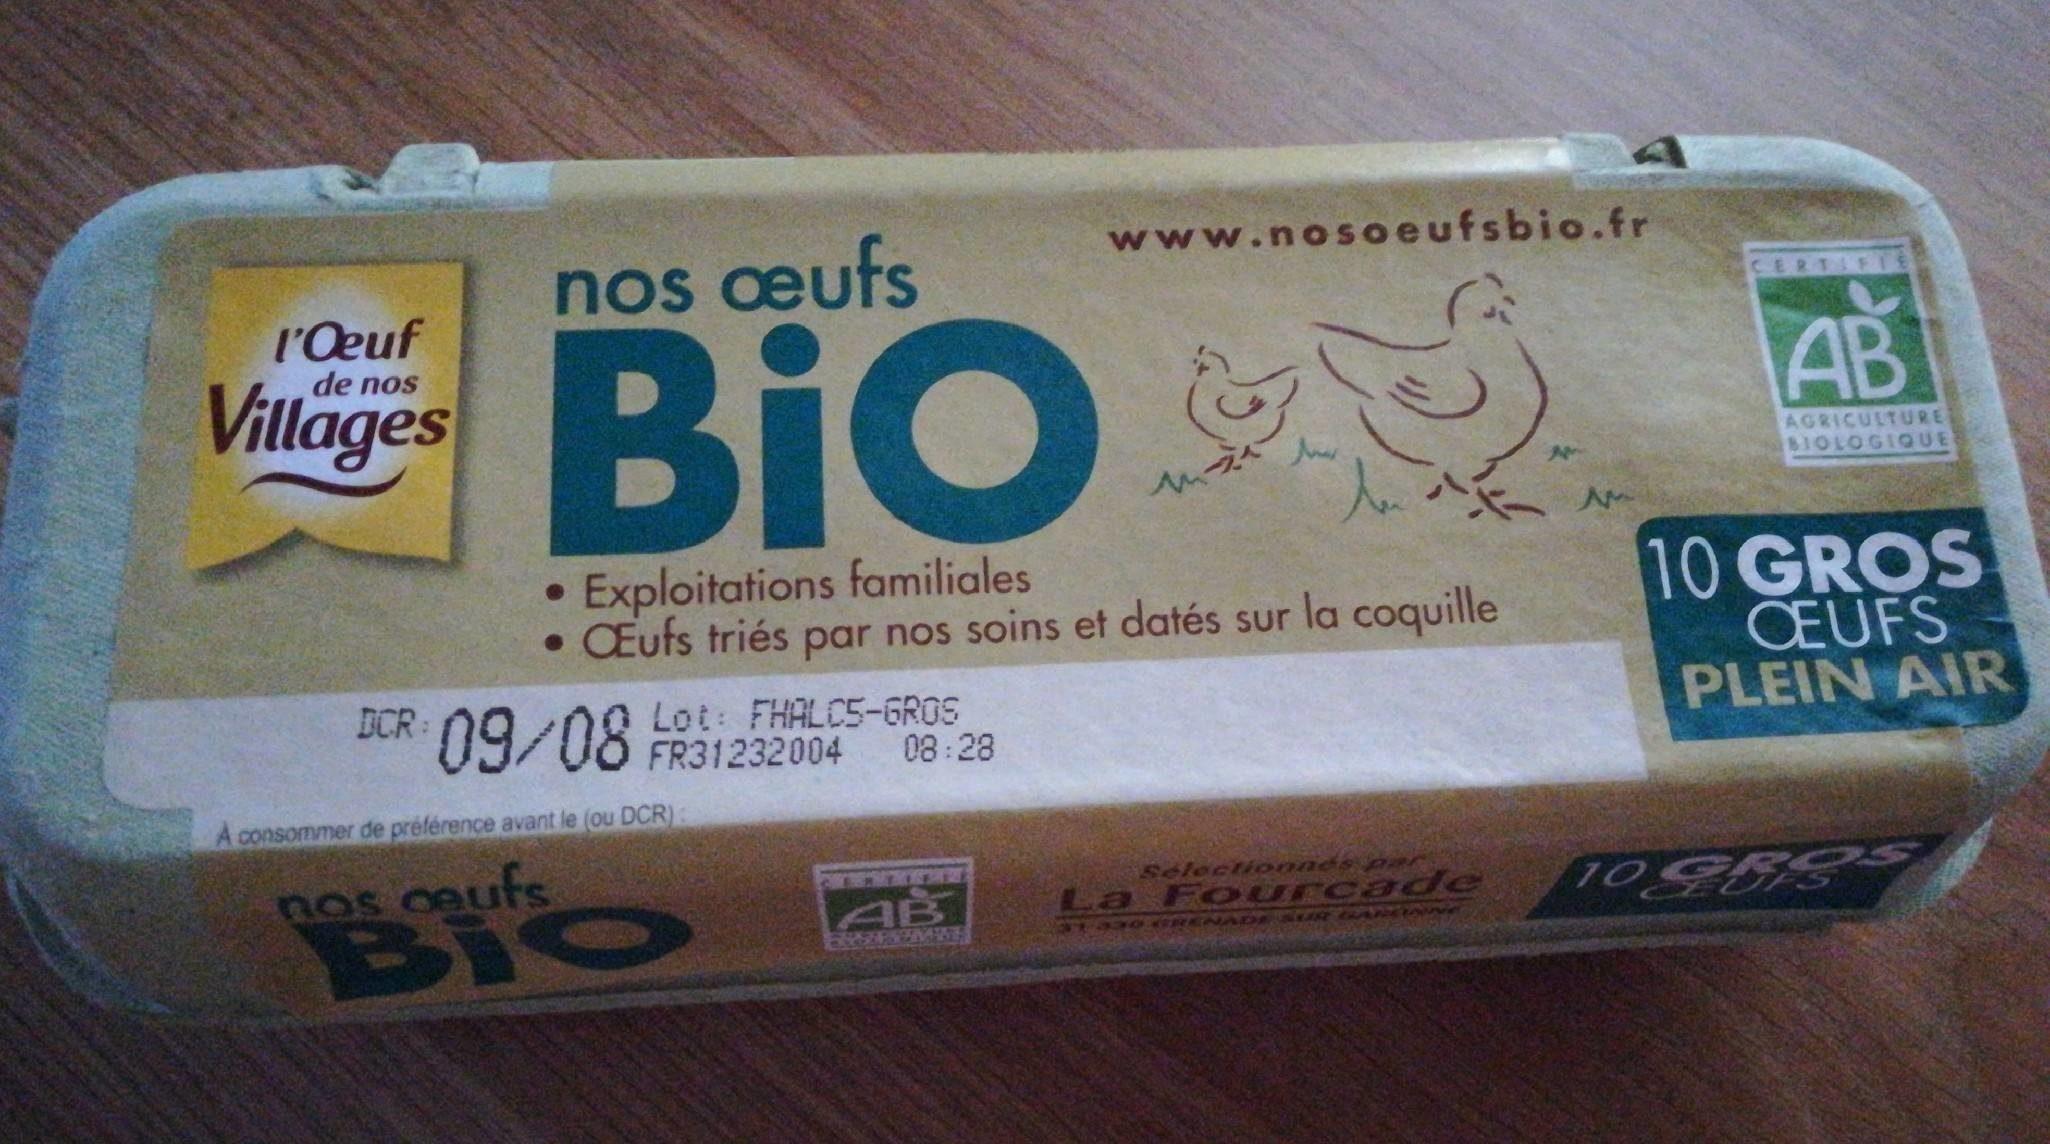 10 Gros œufs Plein Air Bio - Product - fr